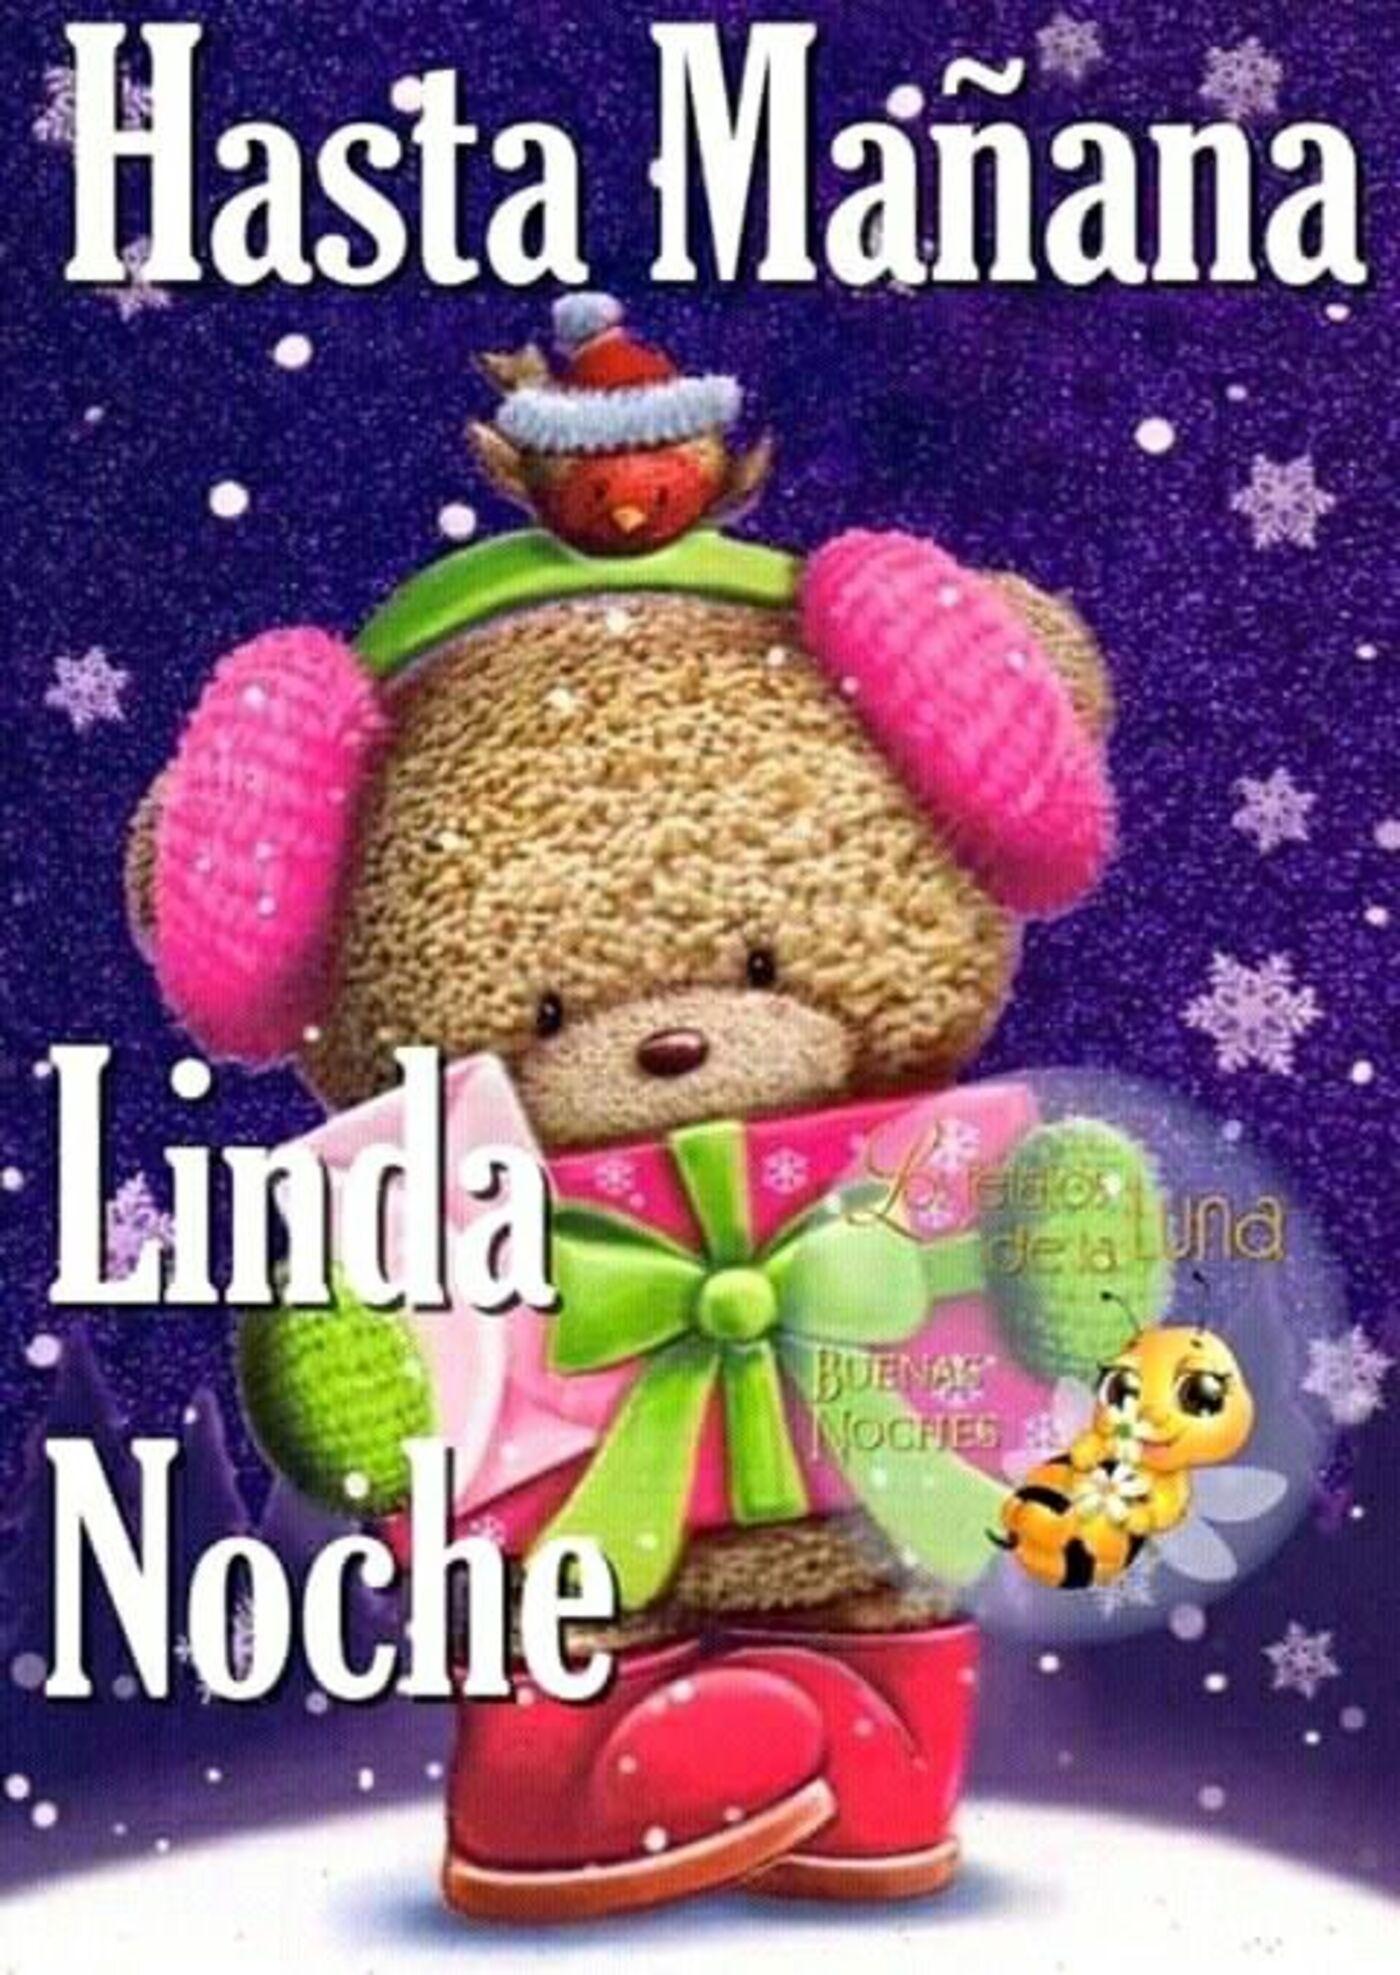 Hasta mañana, Linda Noche